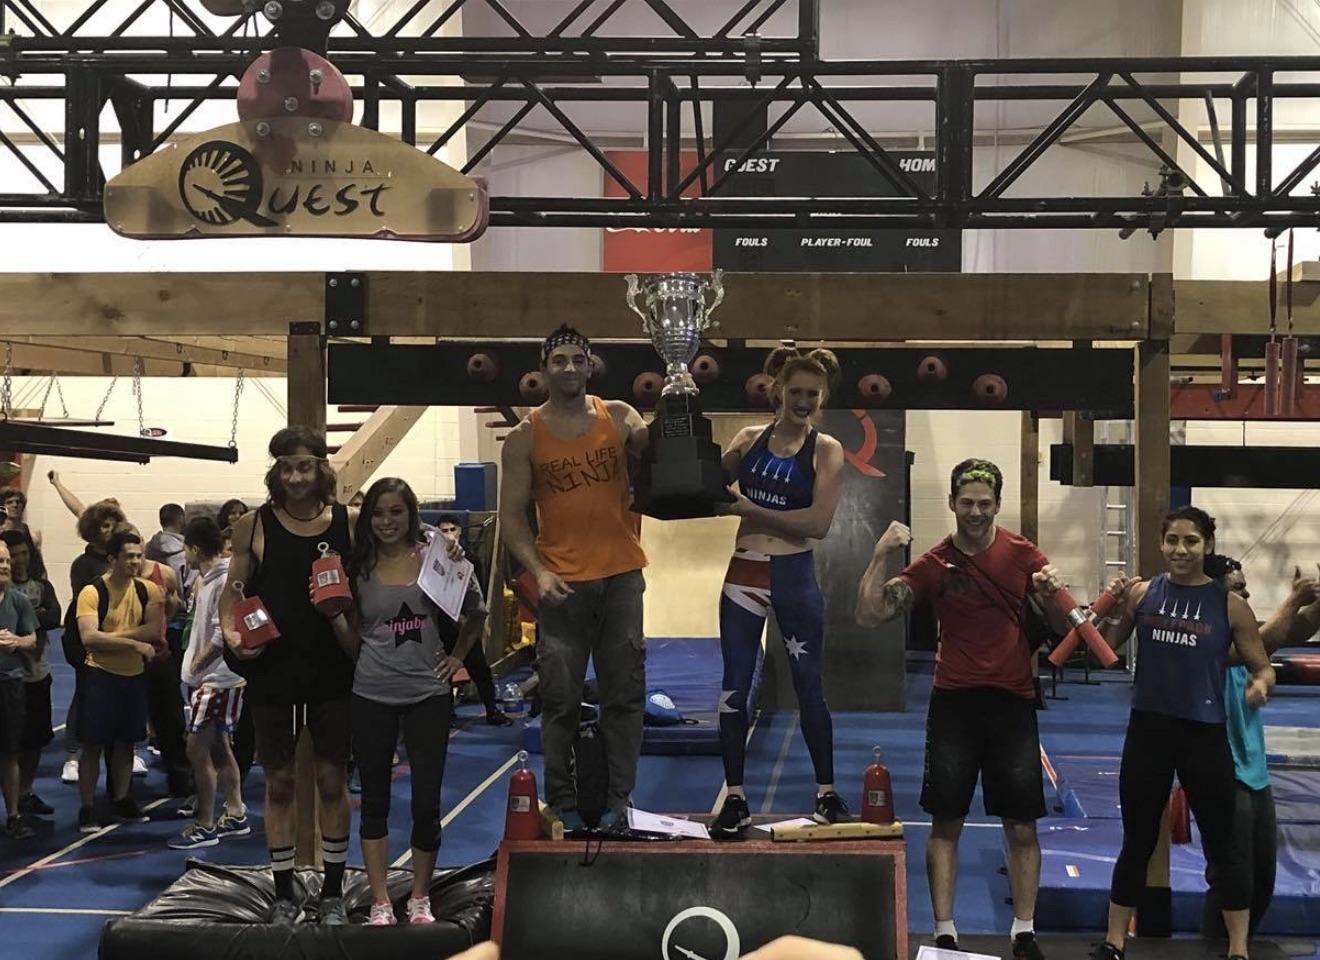 Drew Drechsel & Olivia Vivian win the Season 3 Final Competition of National Ninja League (NNL)